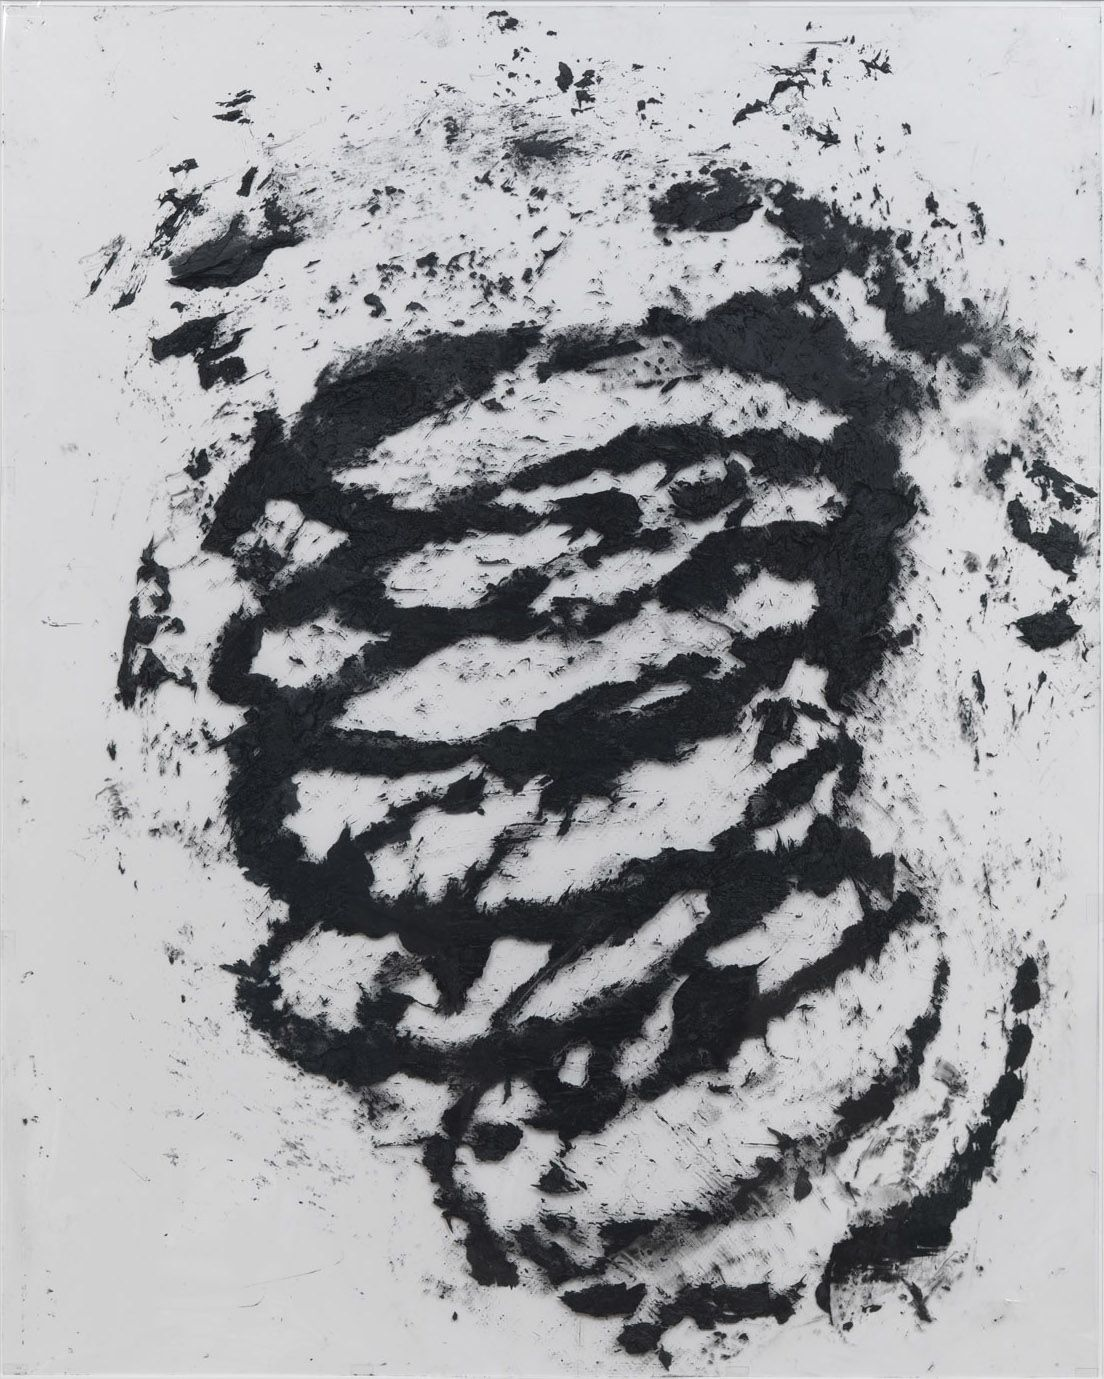 Richard Serra,Transparency #1, 2012.